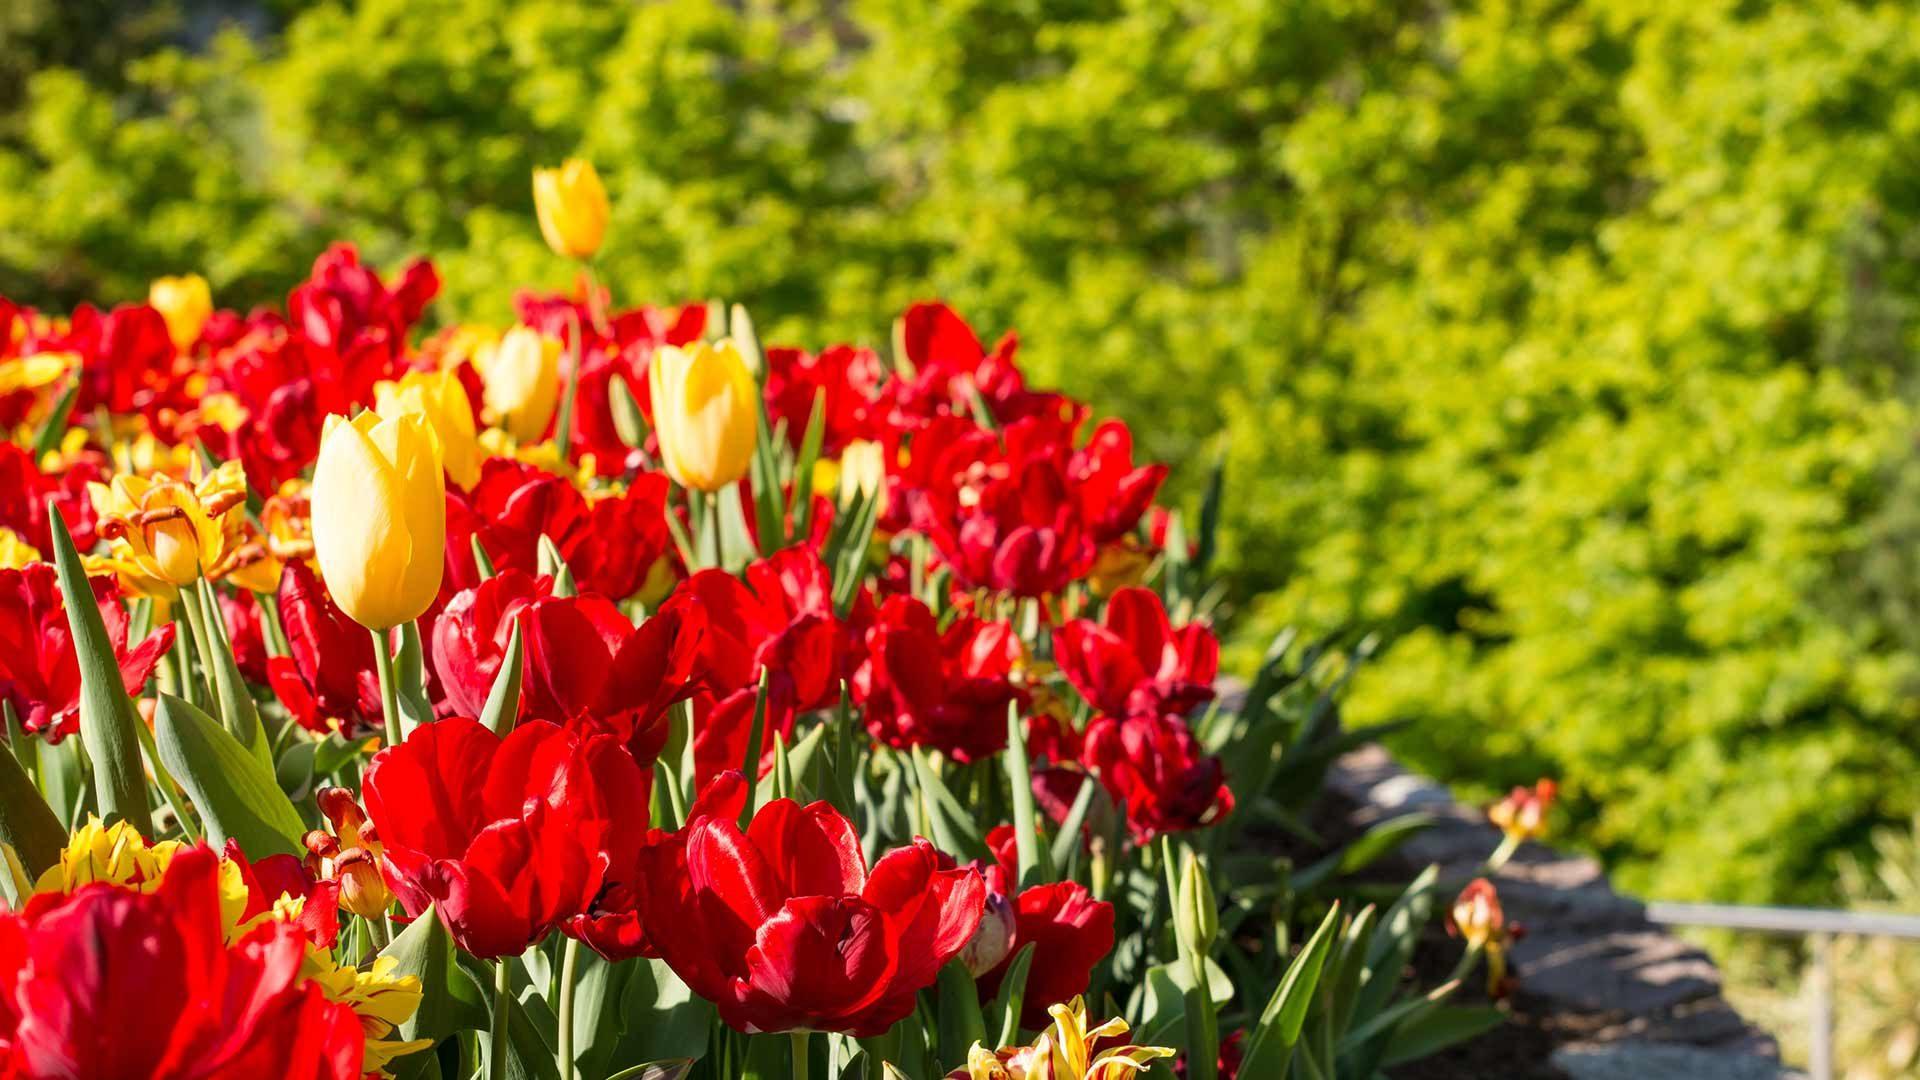 I Giardini di Castel Trauttmansdorff - Tulipani